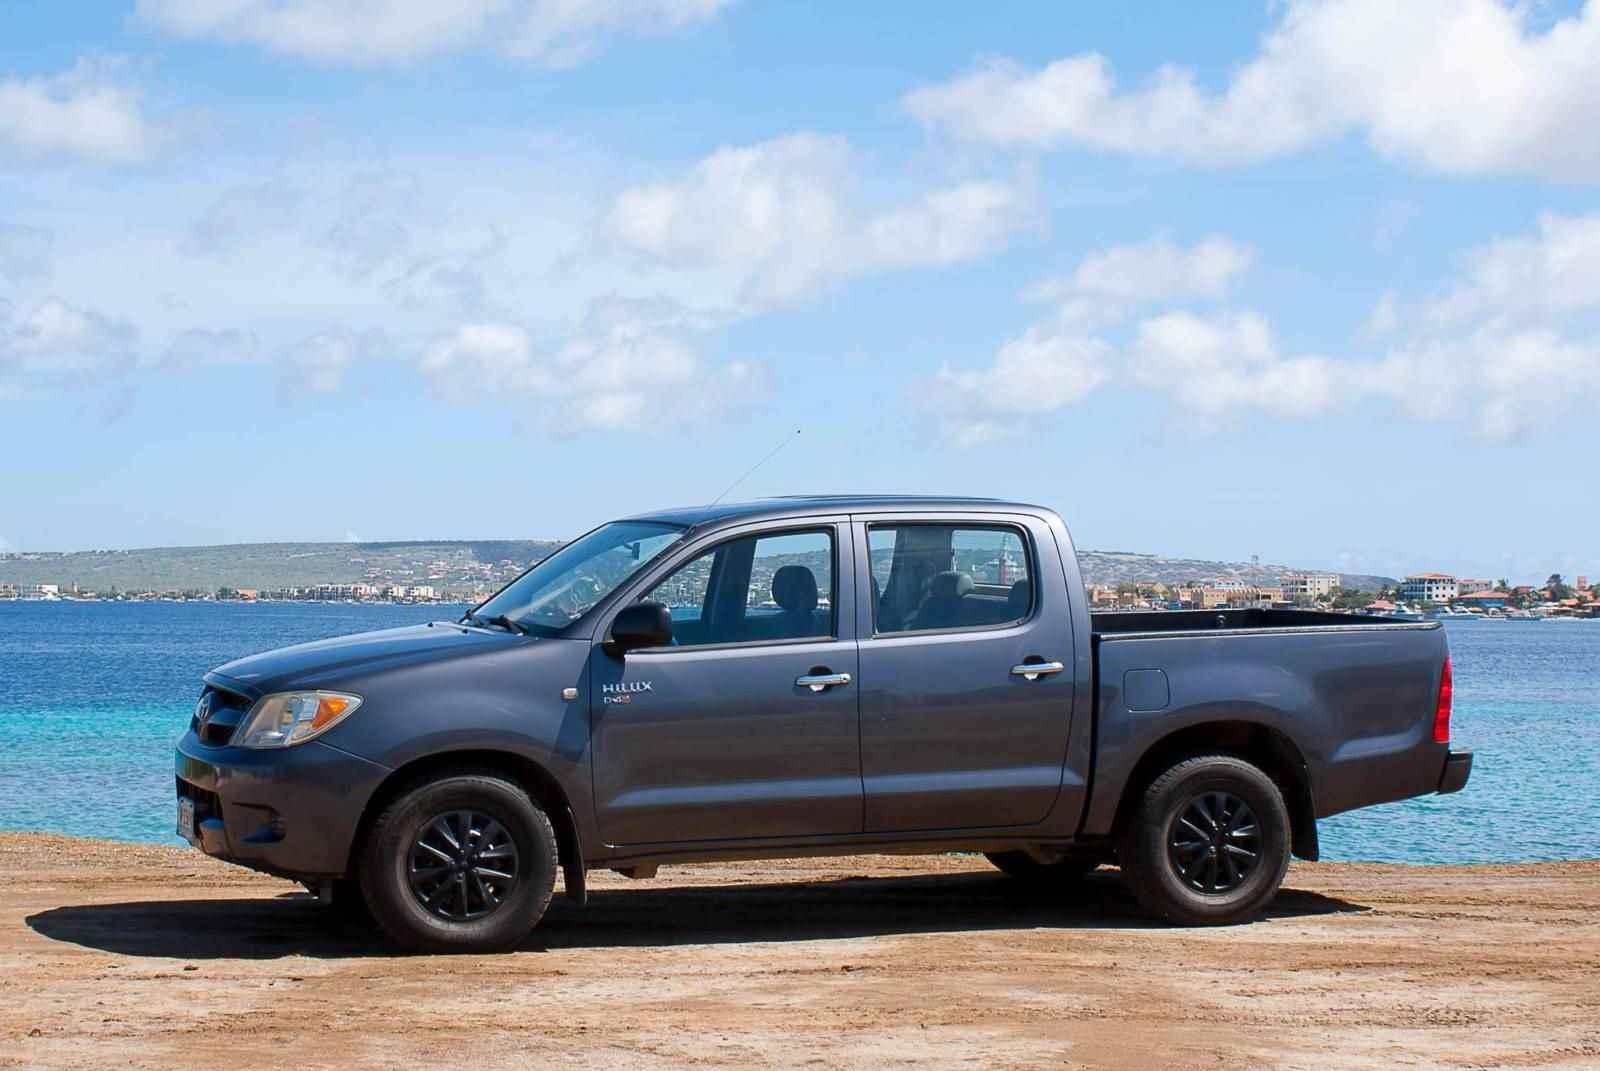 Toyota Hilux Luxury